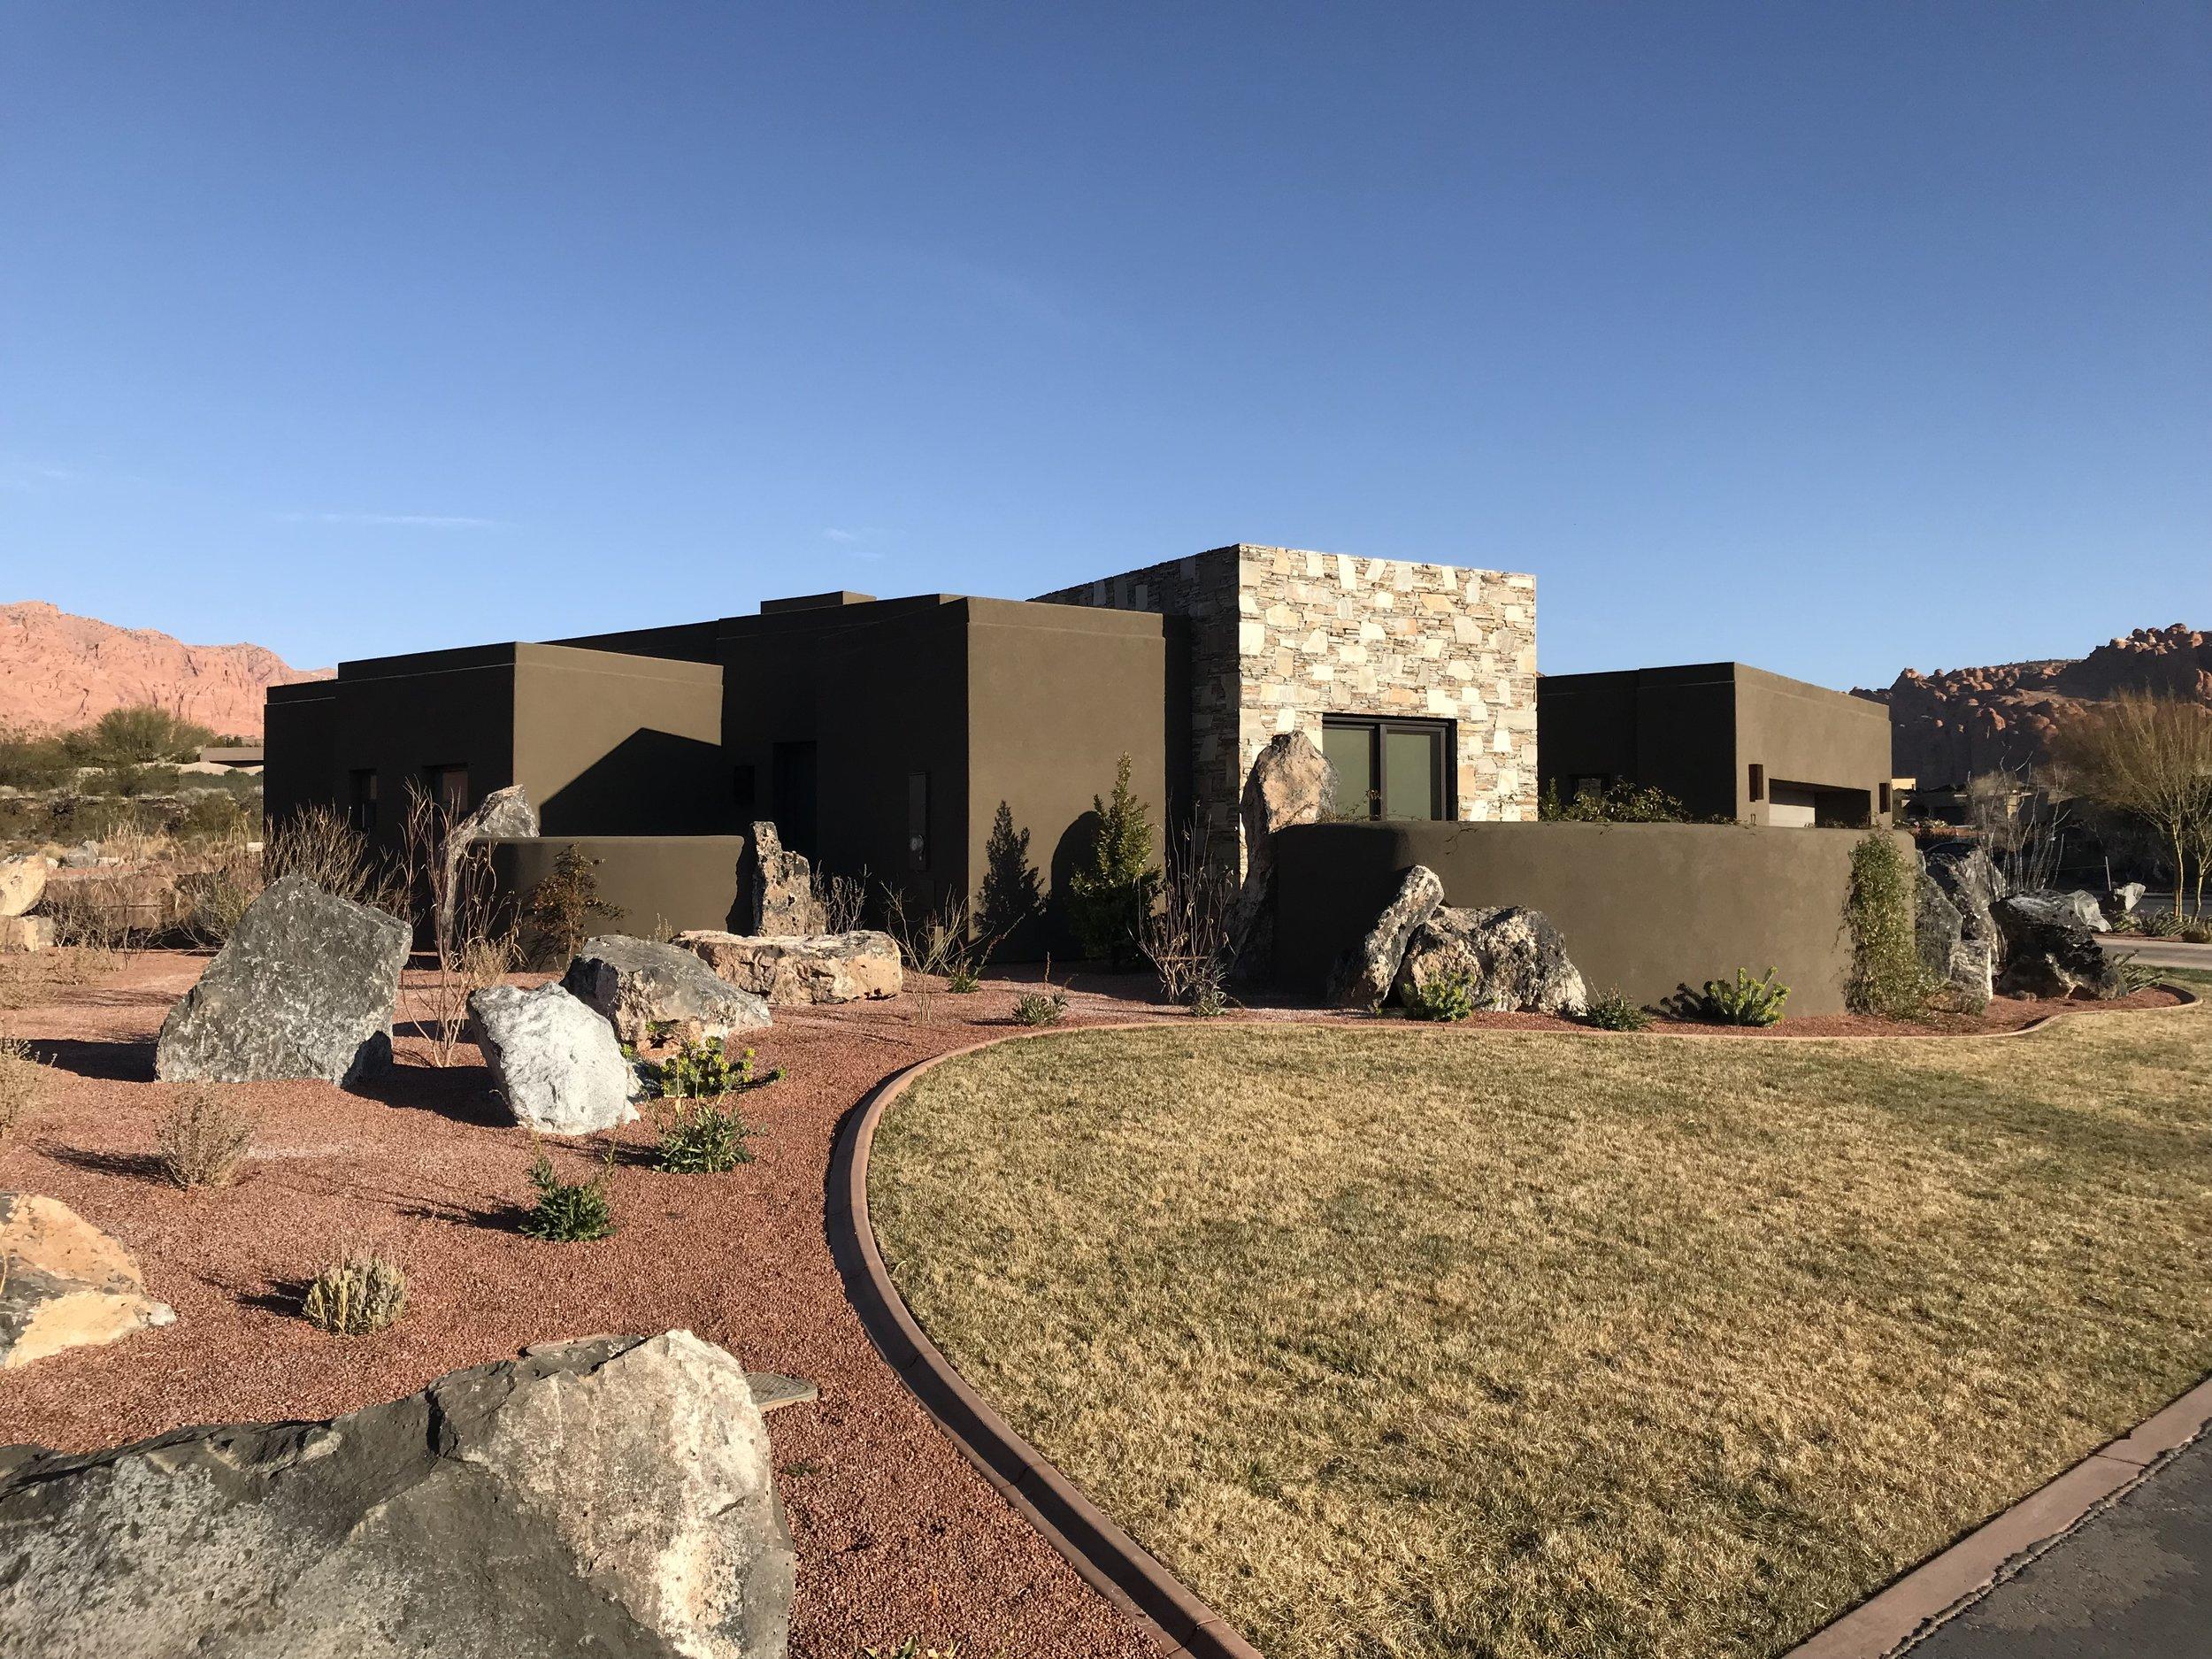 Modern Architecture St. George, Utah